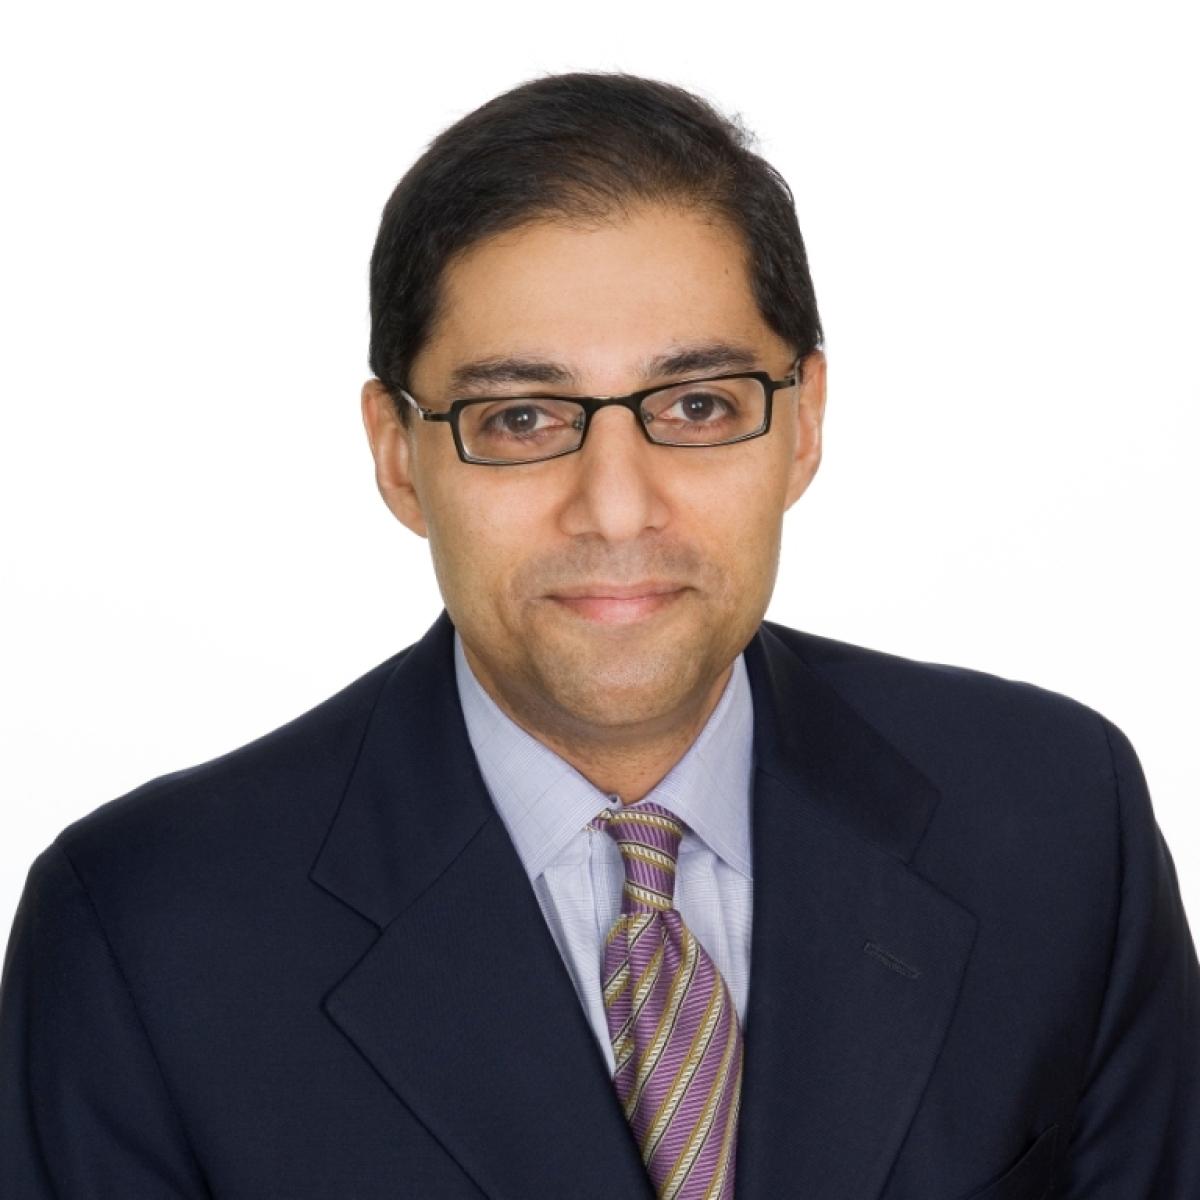 Conversation with Waajid Siddiqui Partner at Hogan Lovells